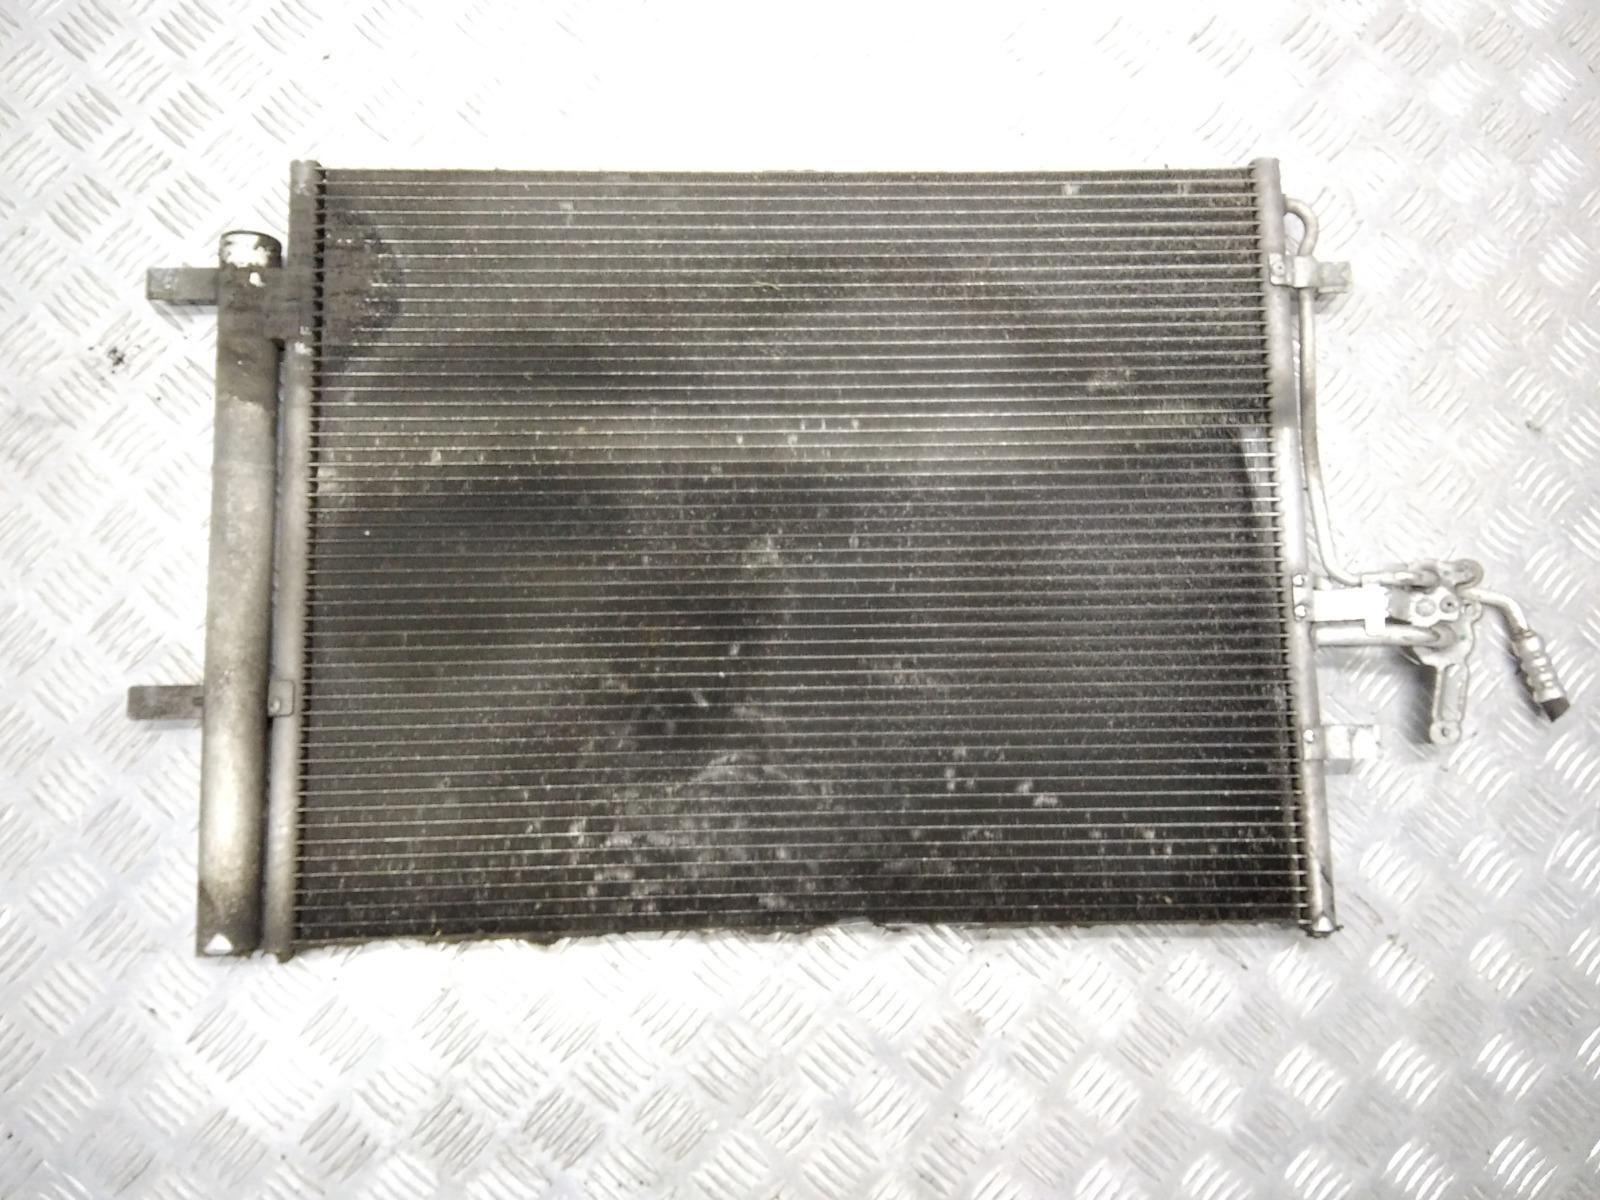 Радиатор кондиционера Ford Mondeo 1.8 TDCI 2009 (б/у)